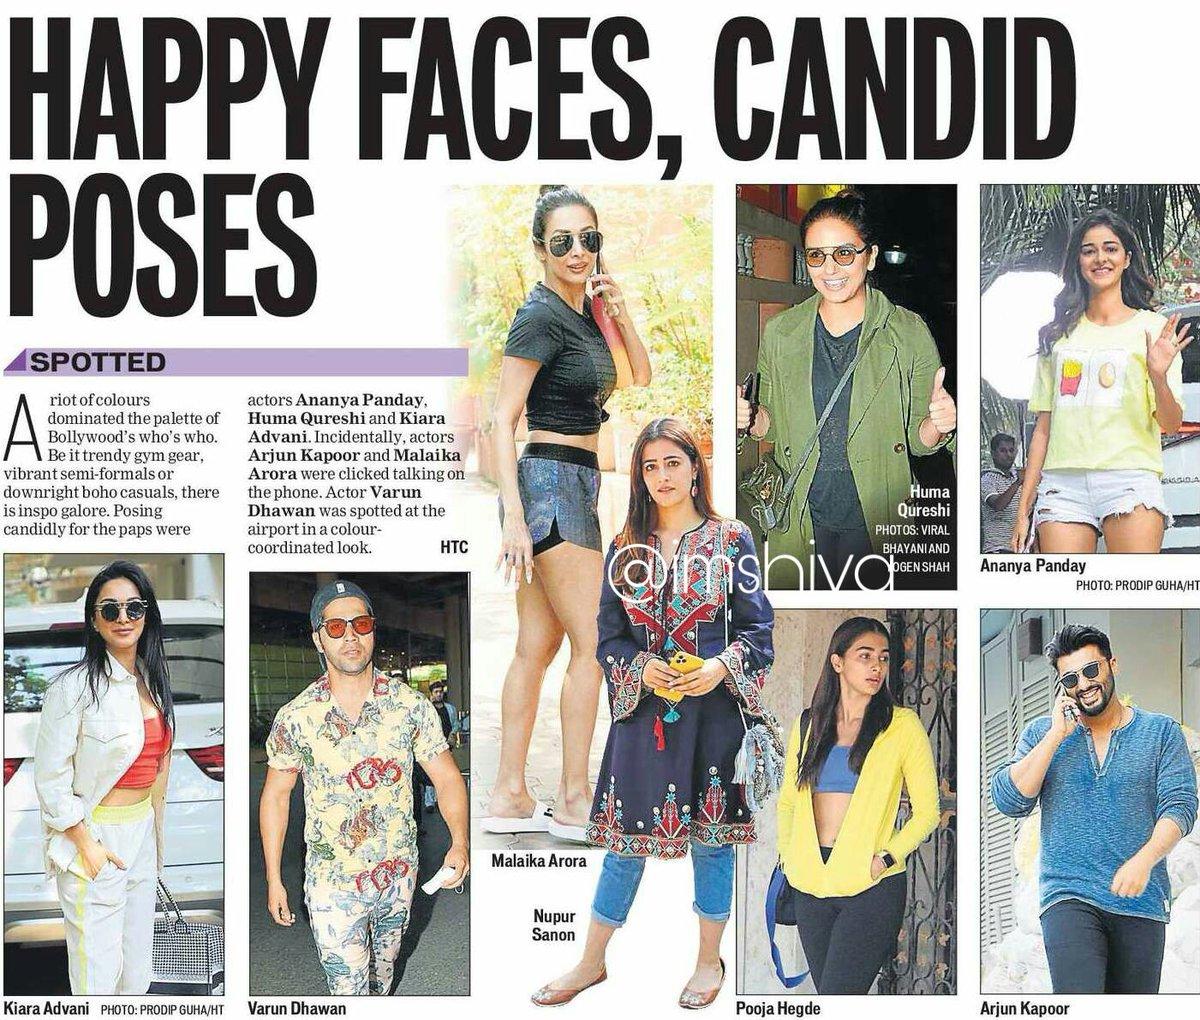 Happy faces, candid poses...   @Varun_dvn @advani_kiara @NupurSanon @hegdepooja @humasqureshi @ananyapandayy @arjunk26  #MalaikaArorapic.twitter.com/Cc45FHHp3a